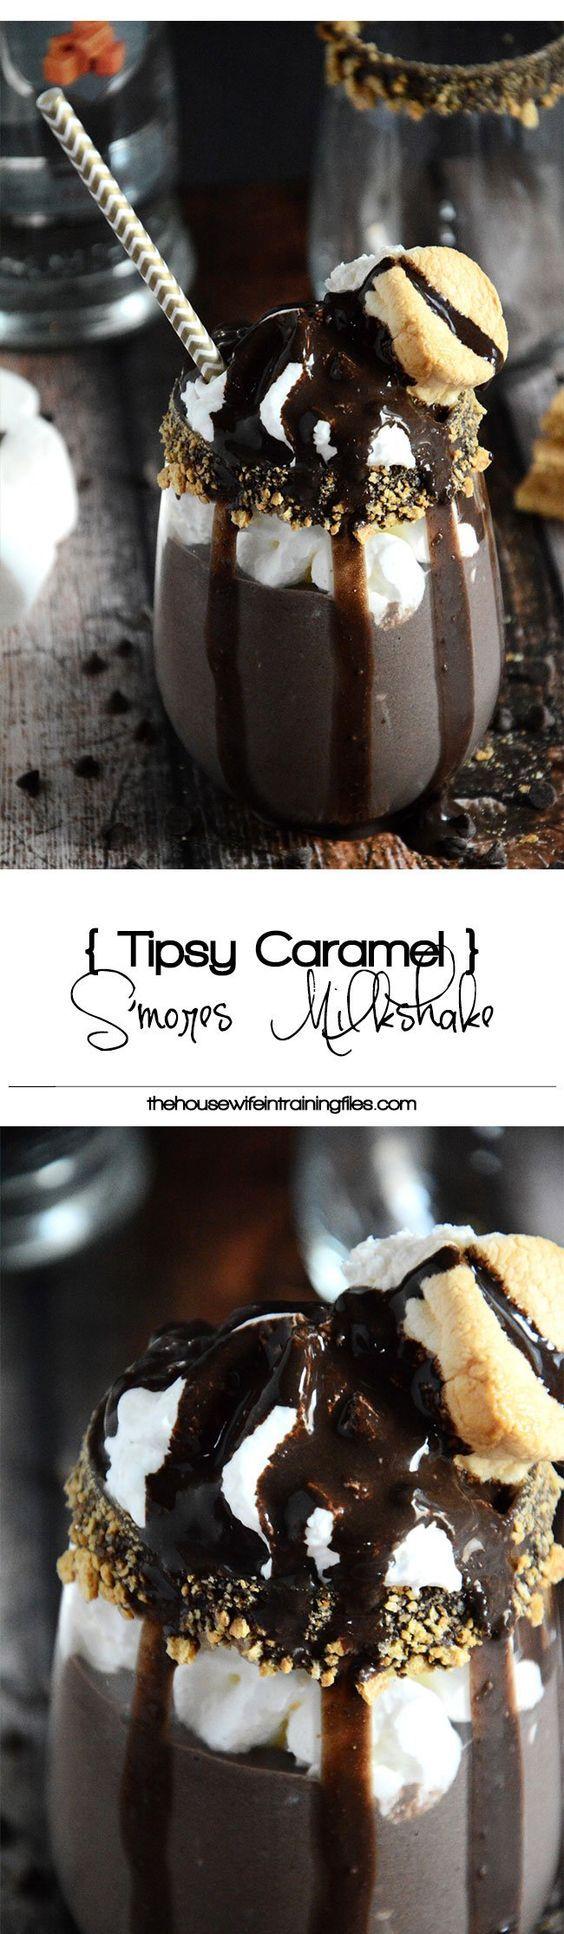 Smores Milkshake Recipe | Ice Cream, Toasted marshmallow, treats, easy, desserts, summer, food, caramel, vodka, cocktails